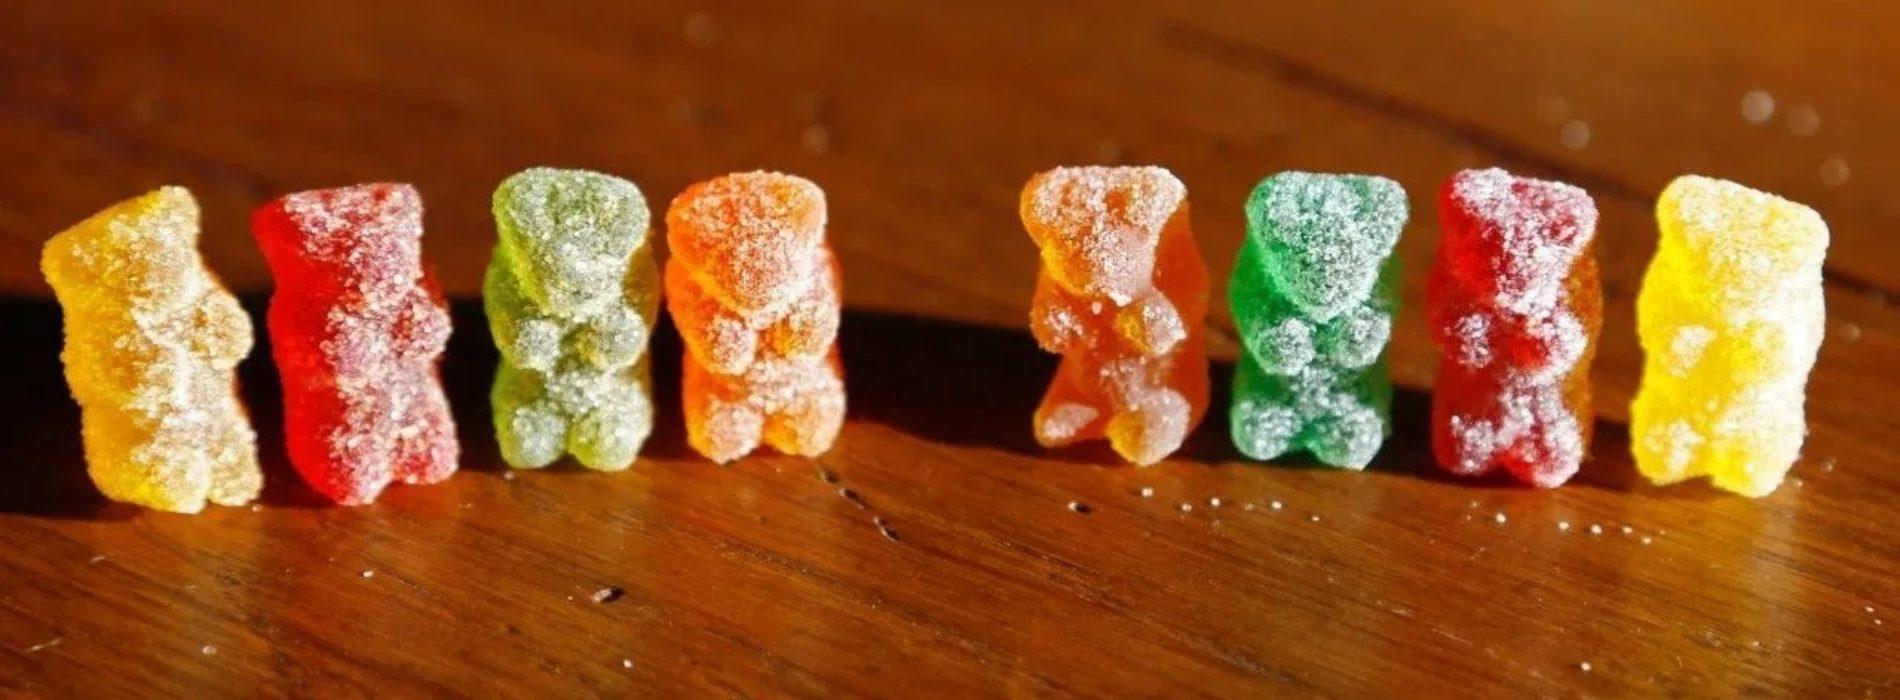 Cannabis Gummy Bear Choices You Can Make